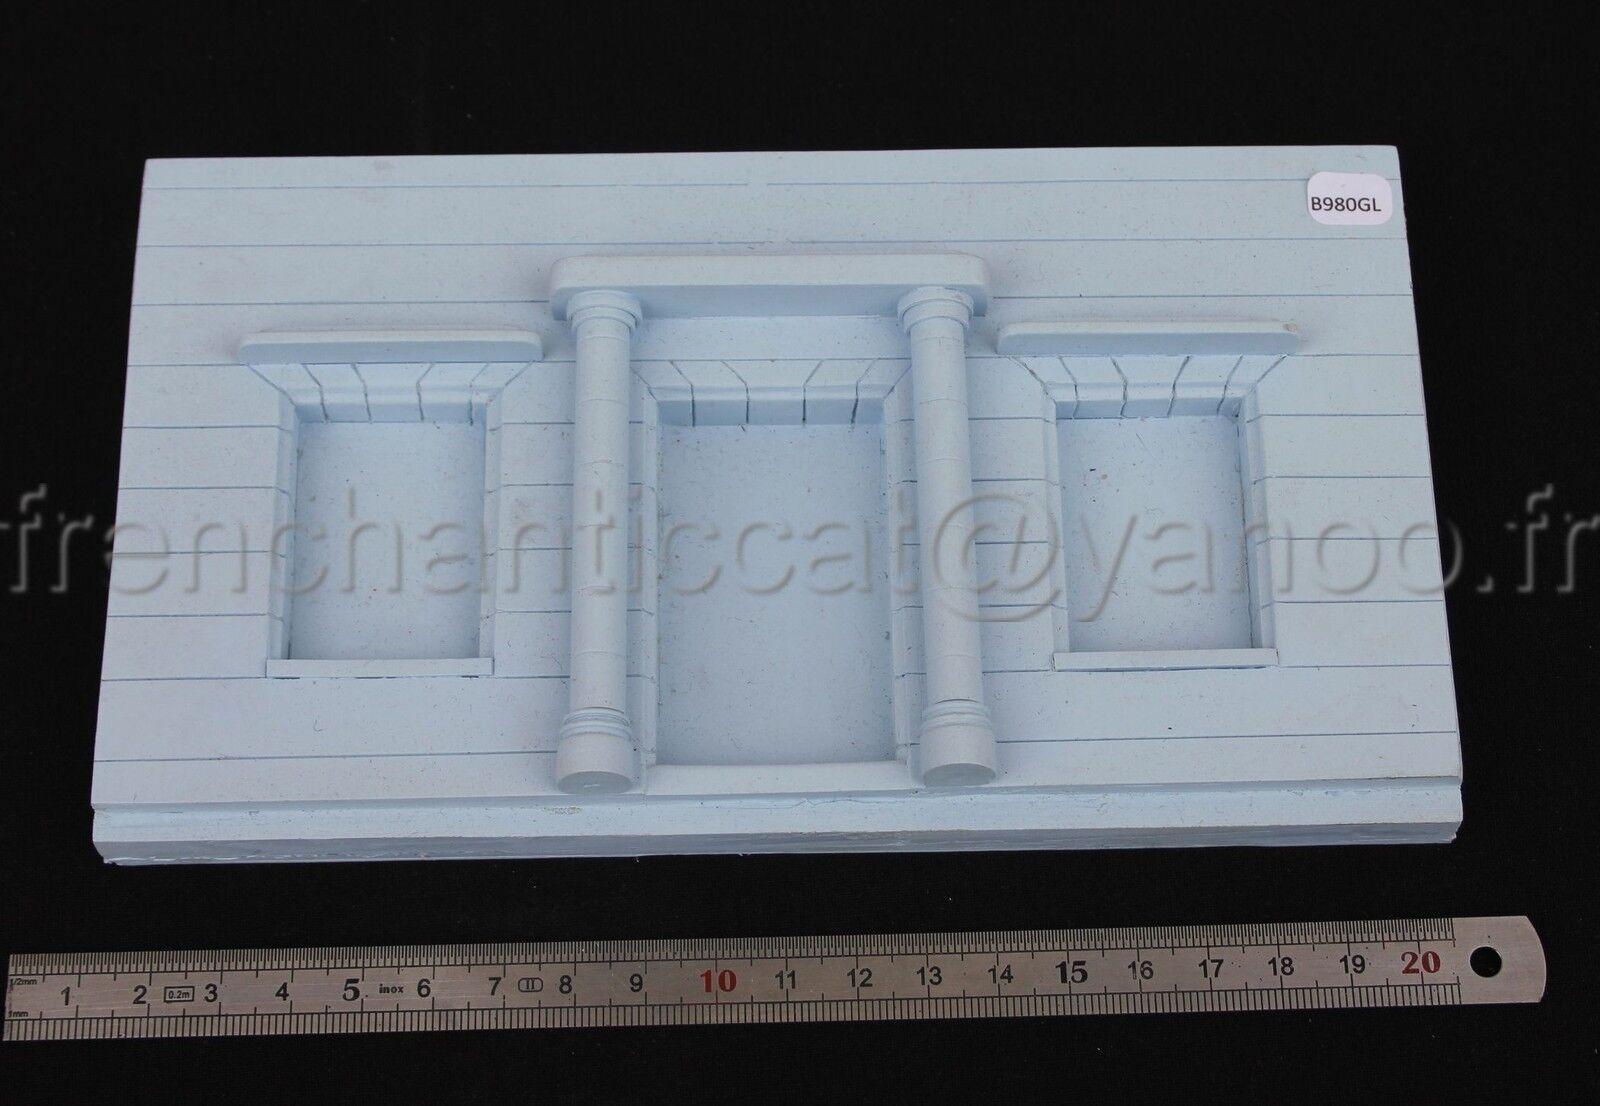 GL Façade 1 43 diorama prougeotype plastique Heco Miniature maison resine voiture